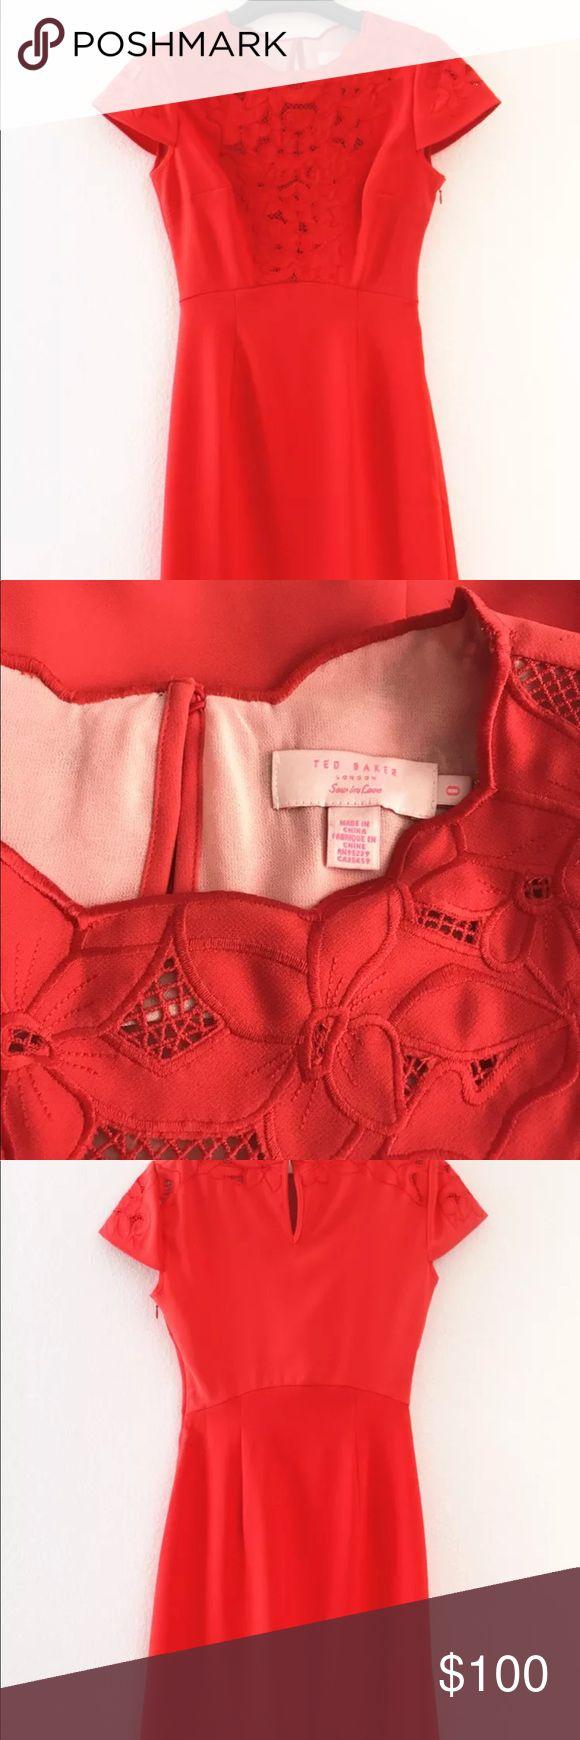 Ted Baker floral embellished true red dress Worn once, like brand new! Ted Baker Dresses Midi